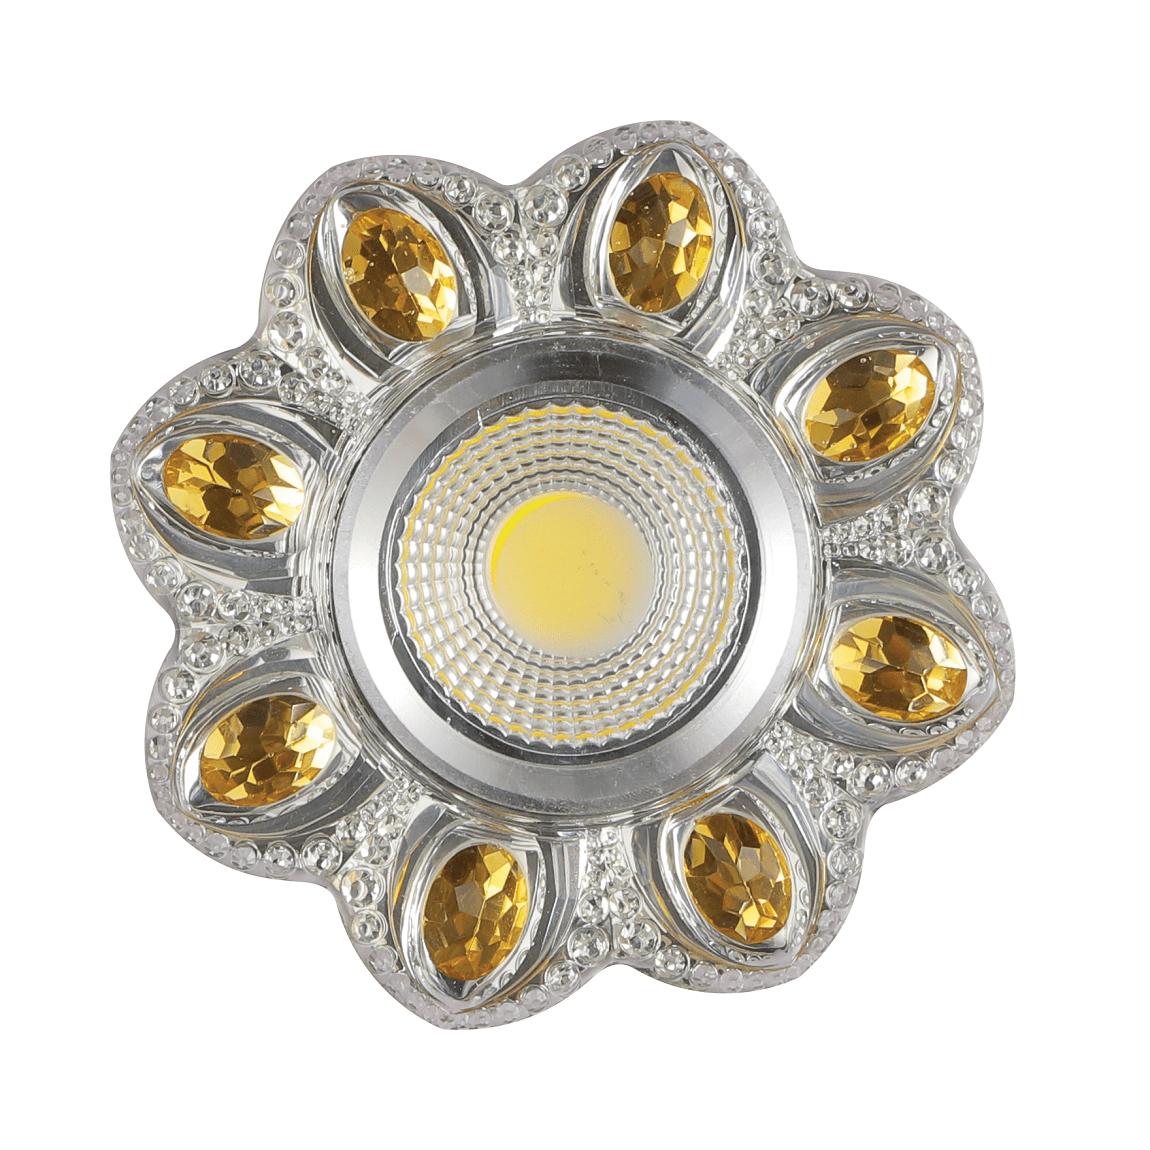 FORLIFE FL-1825 B - 5 Watt Kristal LED Spot